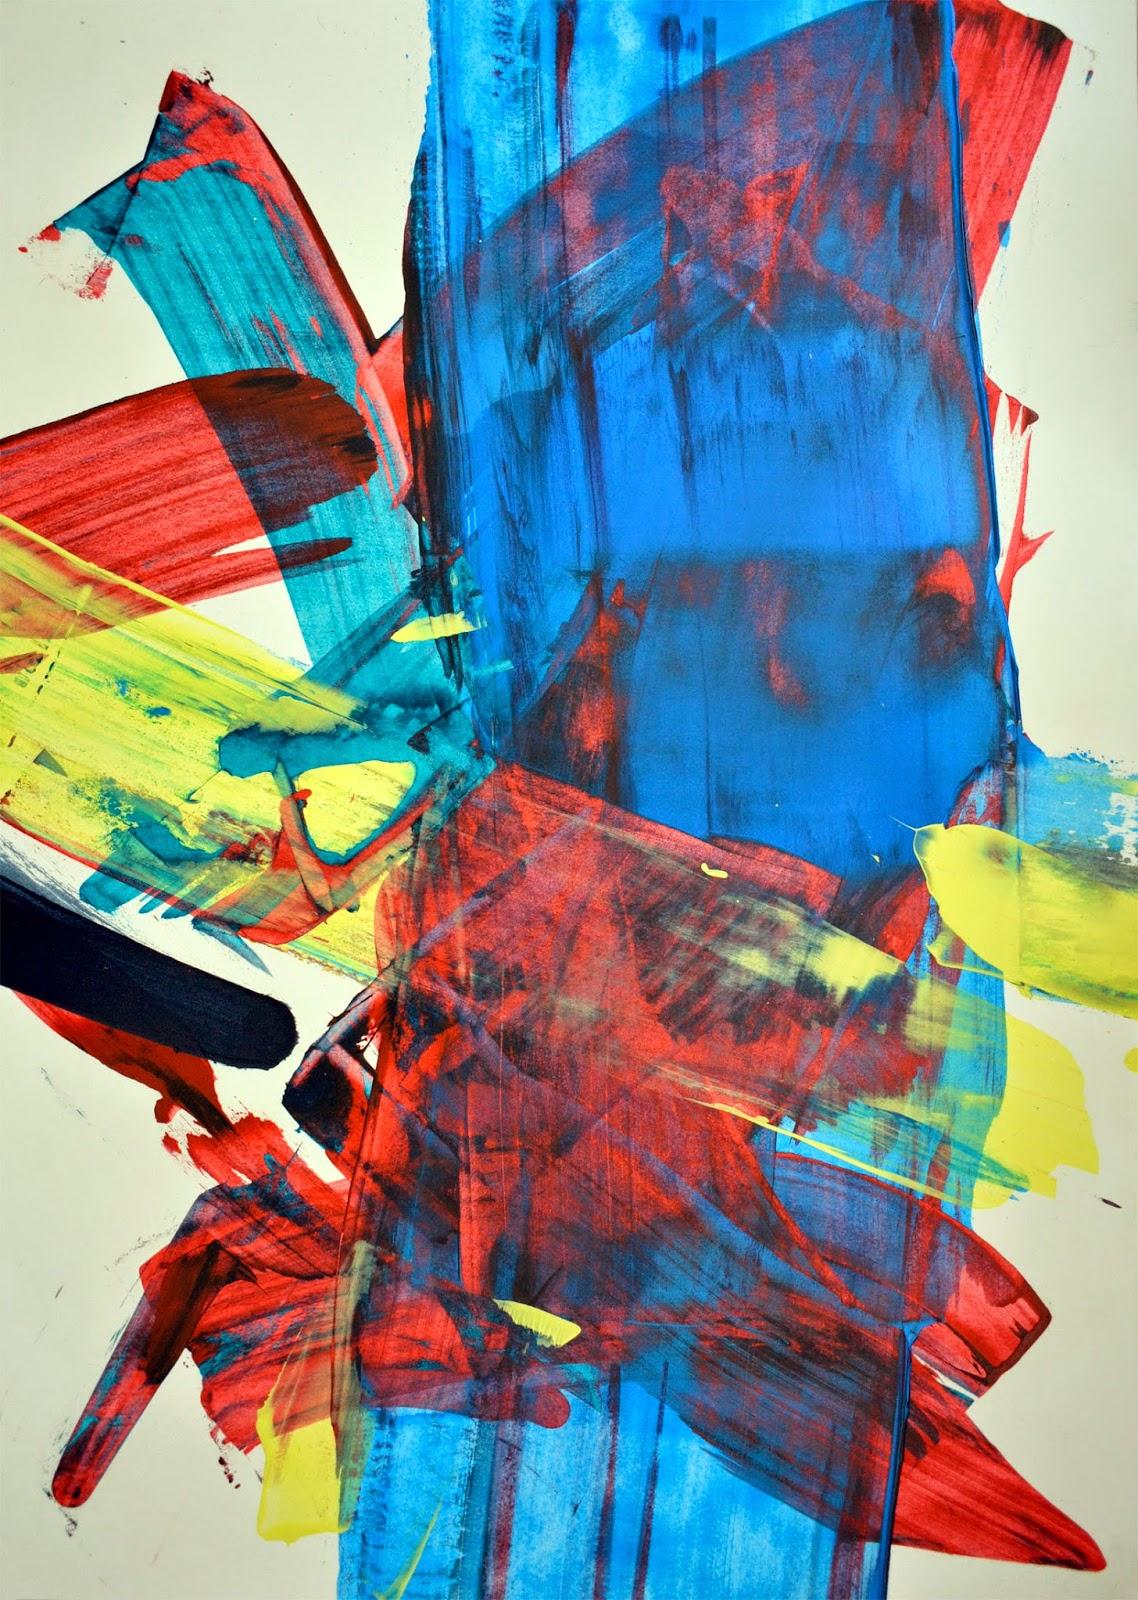 jbb artiste peintre abstraction lyrique